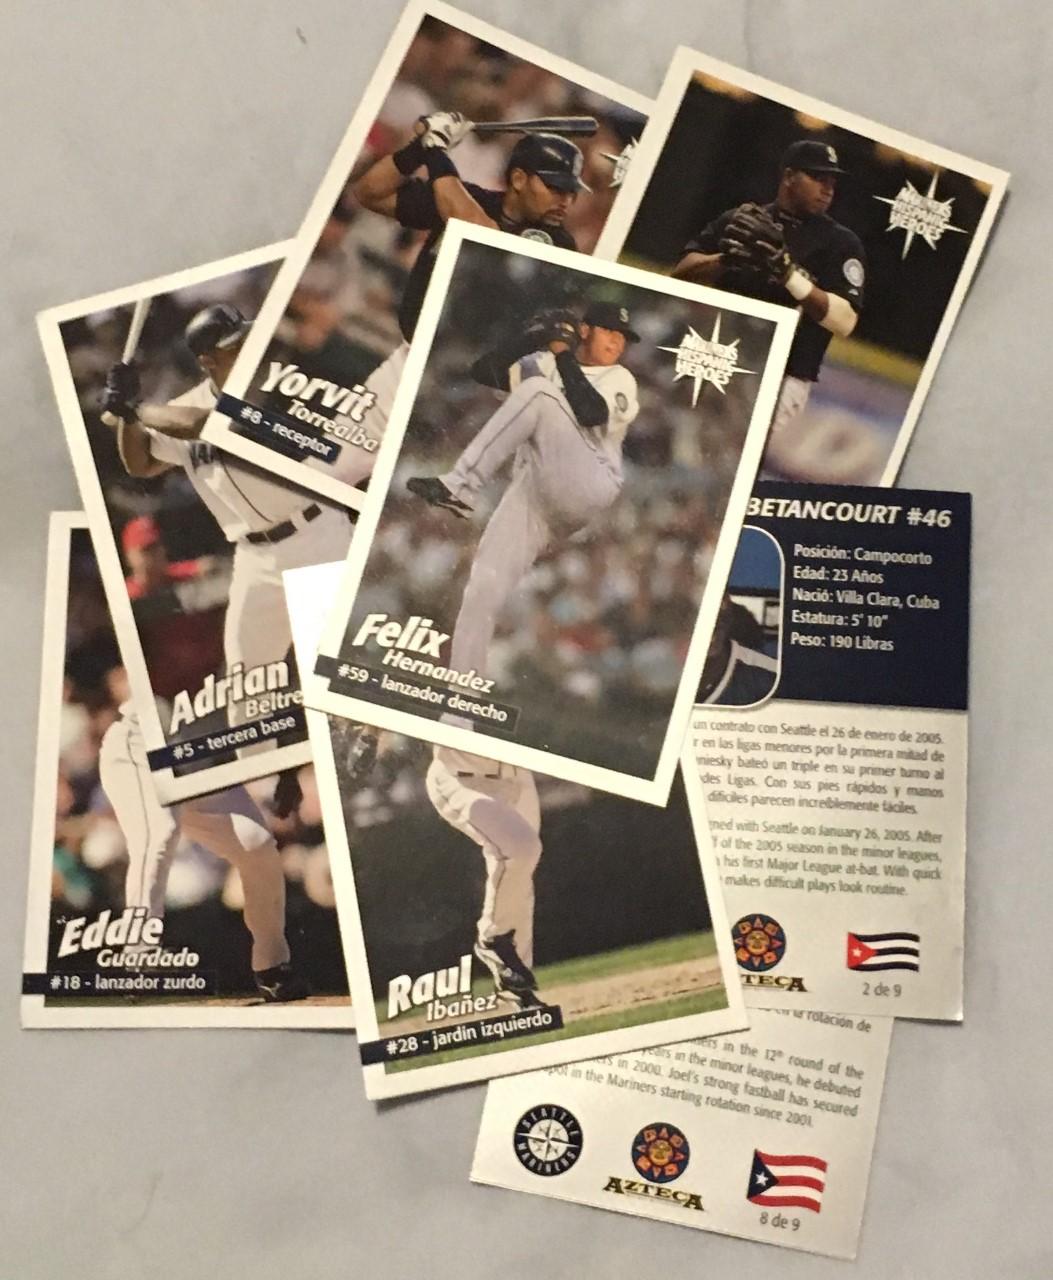 Hispanic Heroes: A Seattle Mariners promo cardset